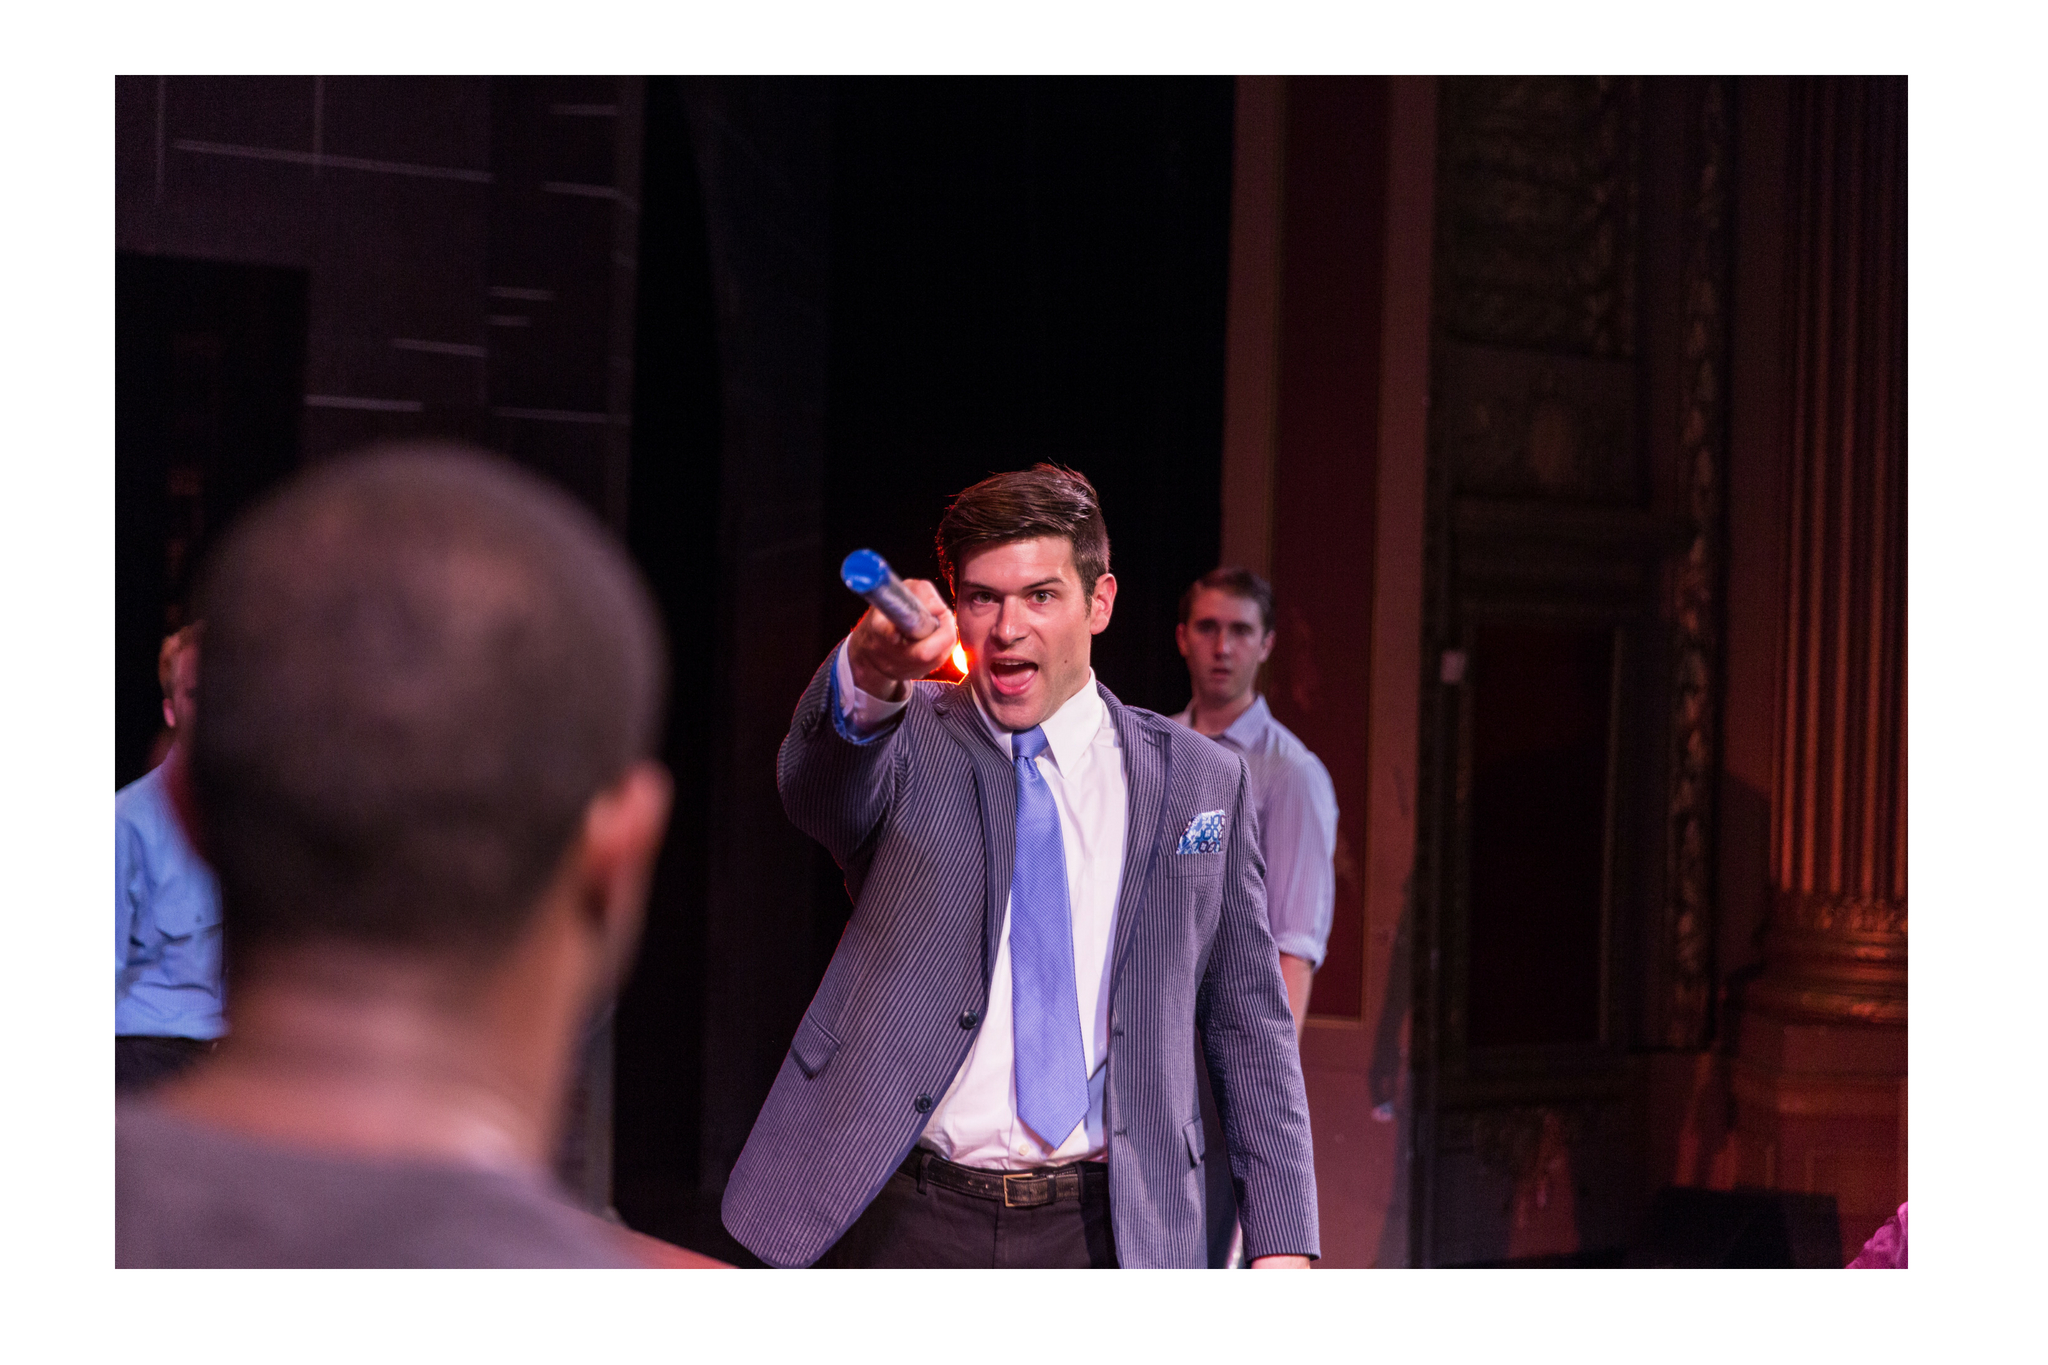 Matt Giampietro (Tybalt) in Romeo & Juliet, CSC2, 2015-Photo by Nile Hawver